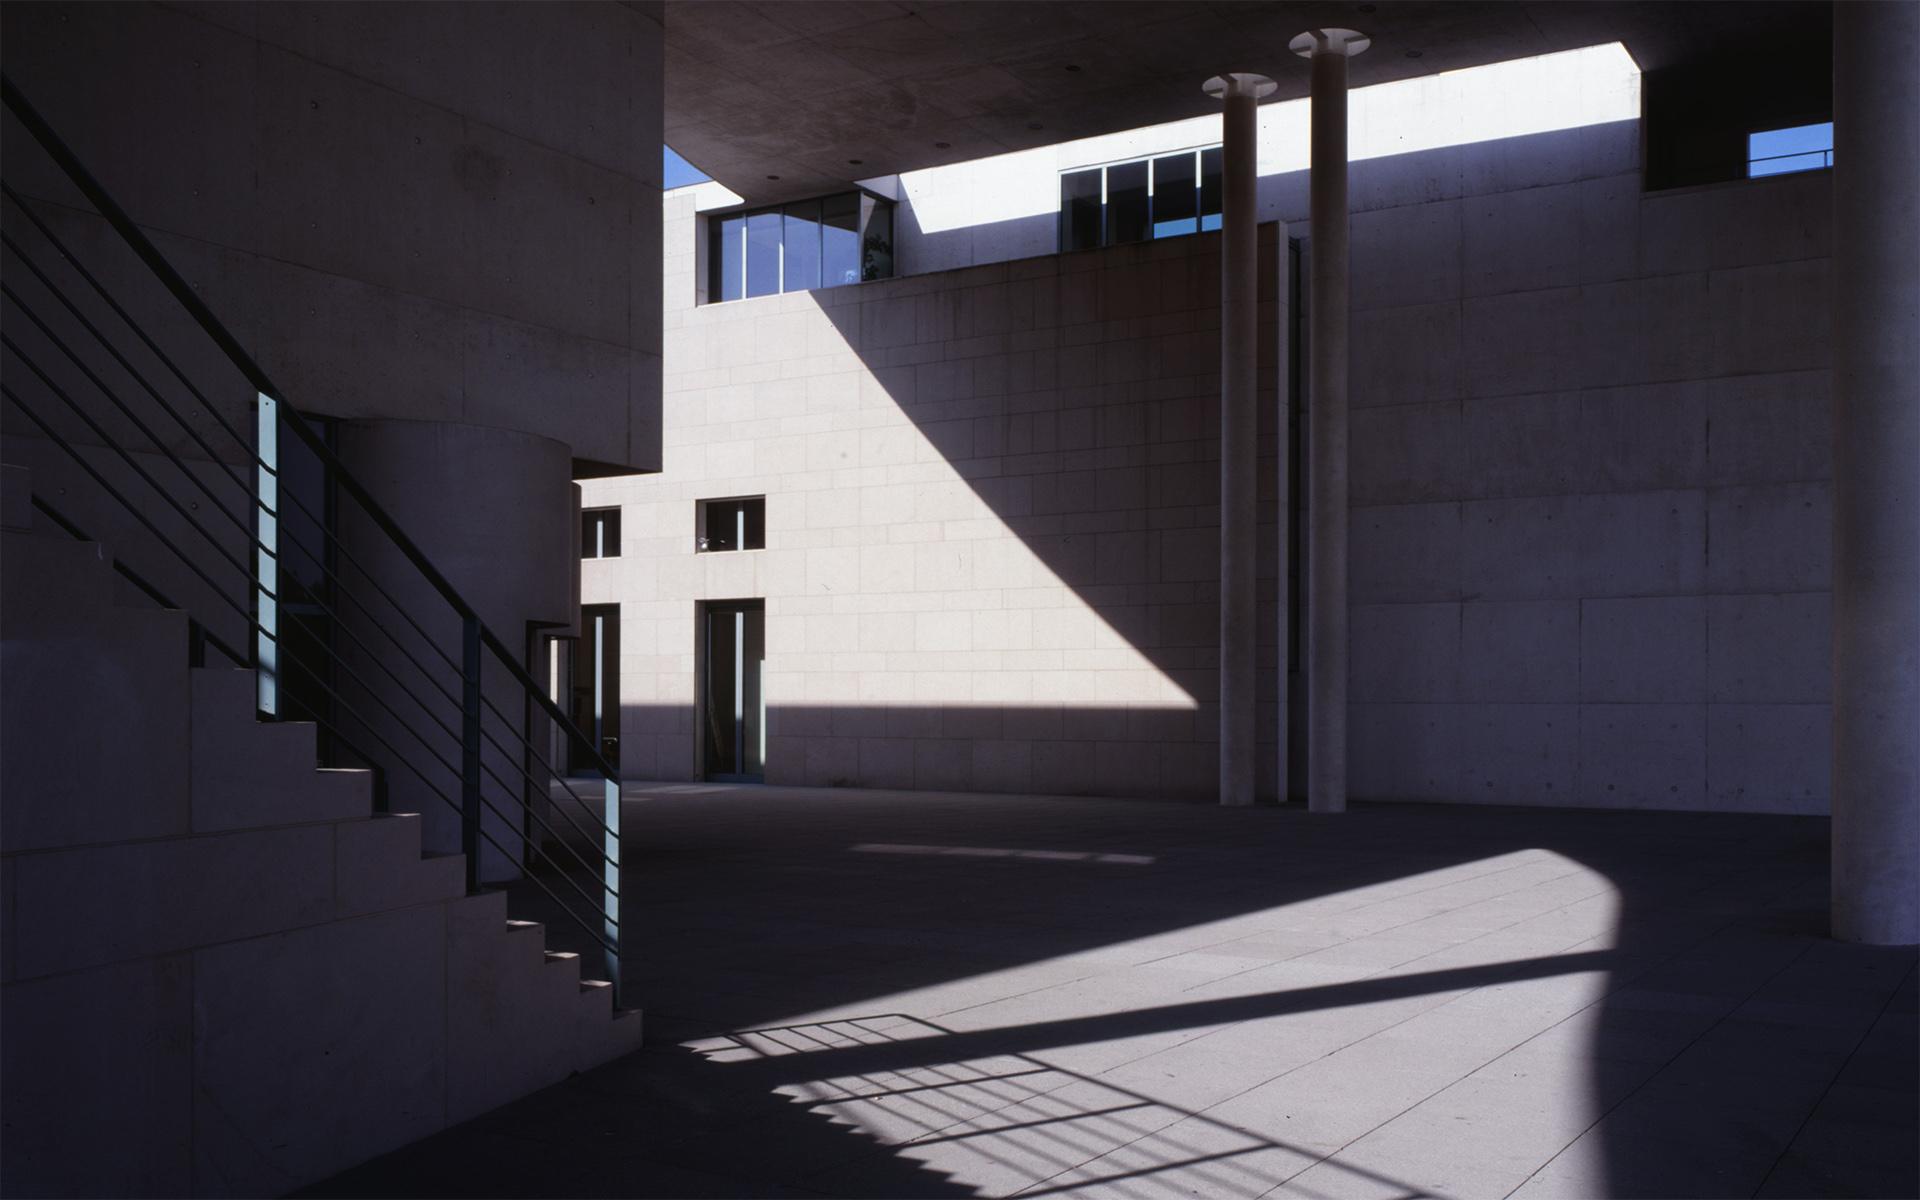 Kunsttmuseum Bonn